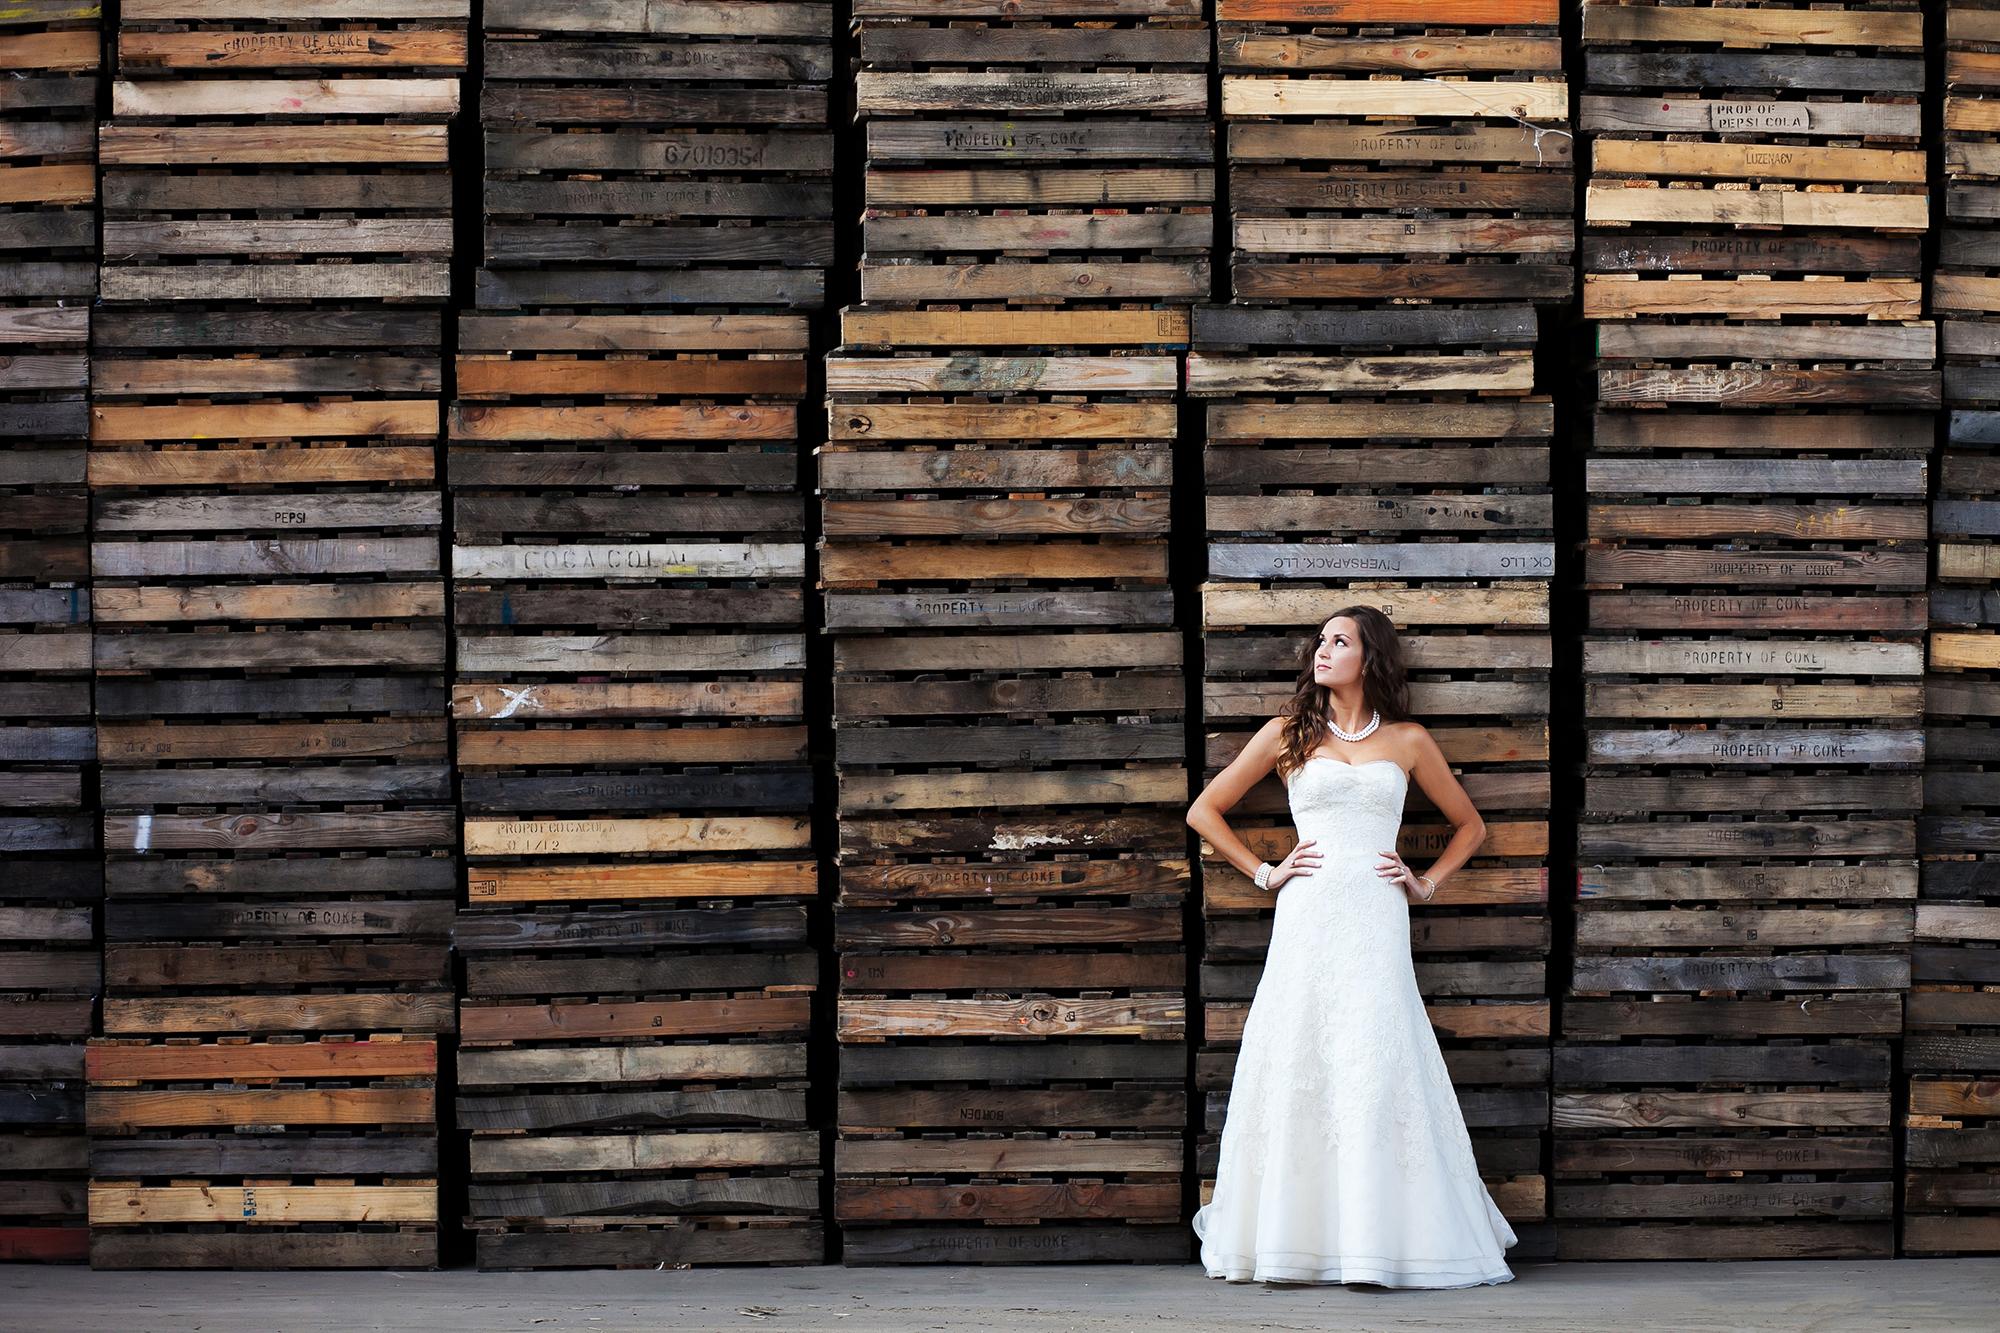 adam-szarmack-bridal-weddings-wood-wall.jpg